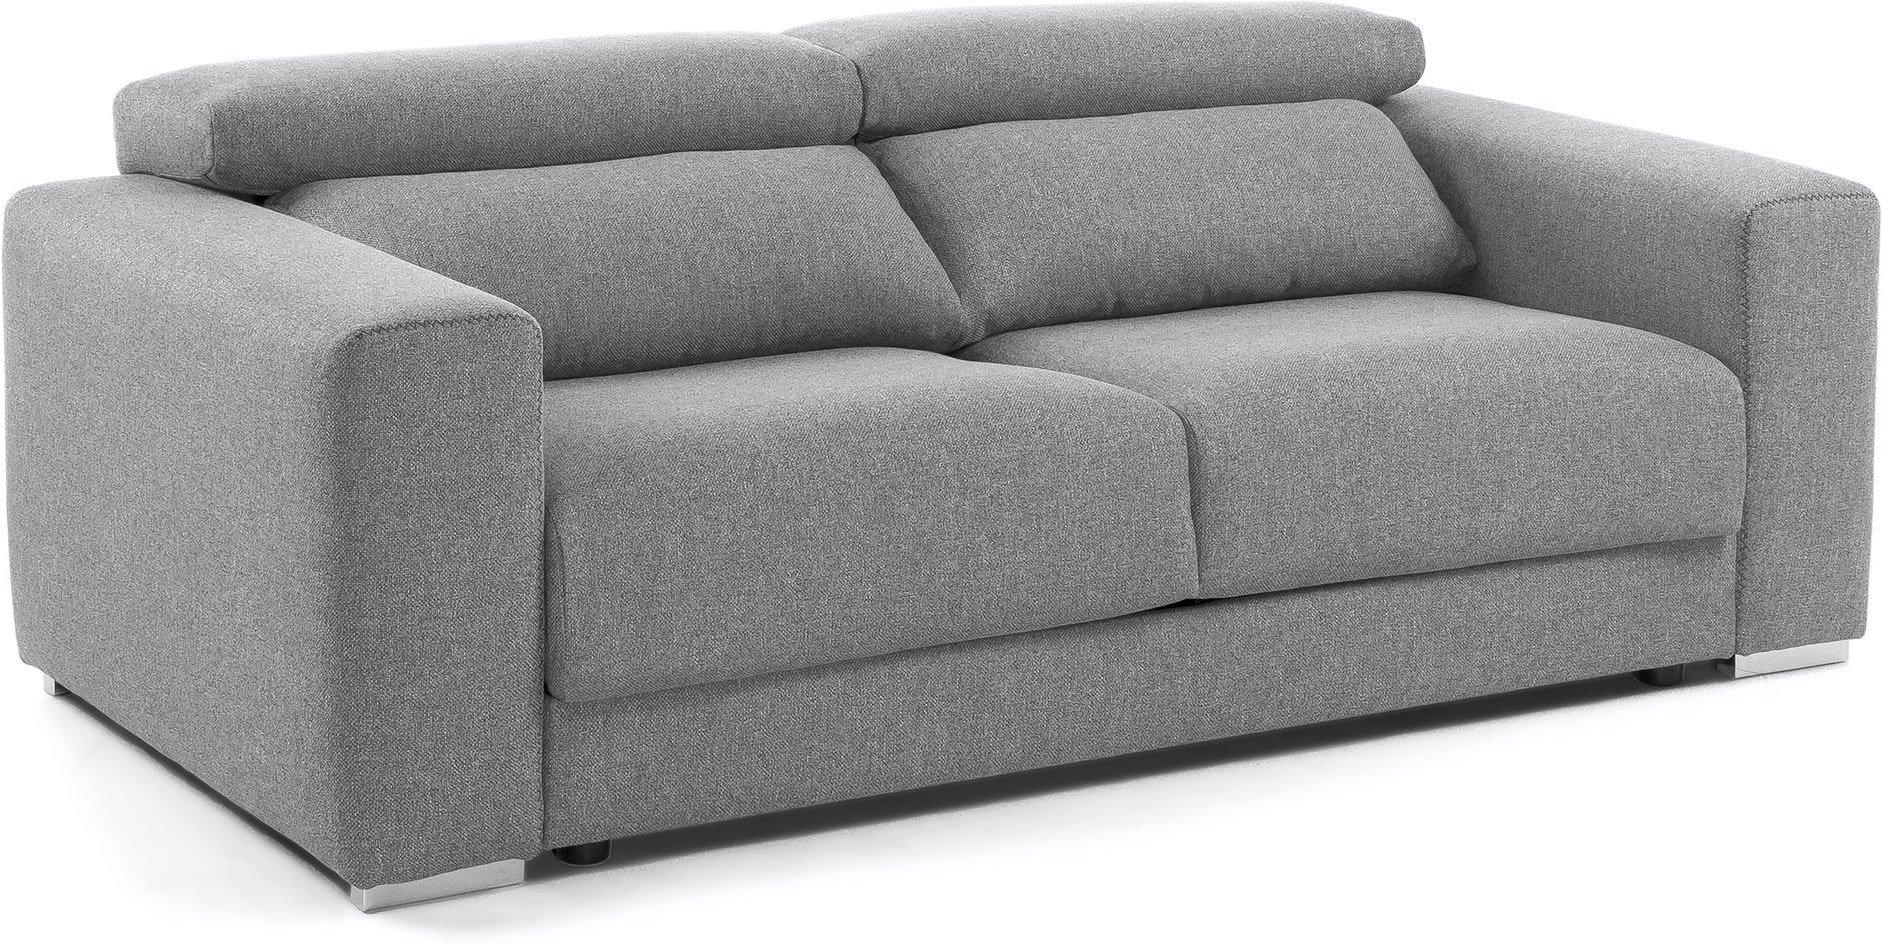 Atlanta, 3-personers sofa by LaForma (H: 76 cm. B: 210 cm. L: 108 cm., Grå)